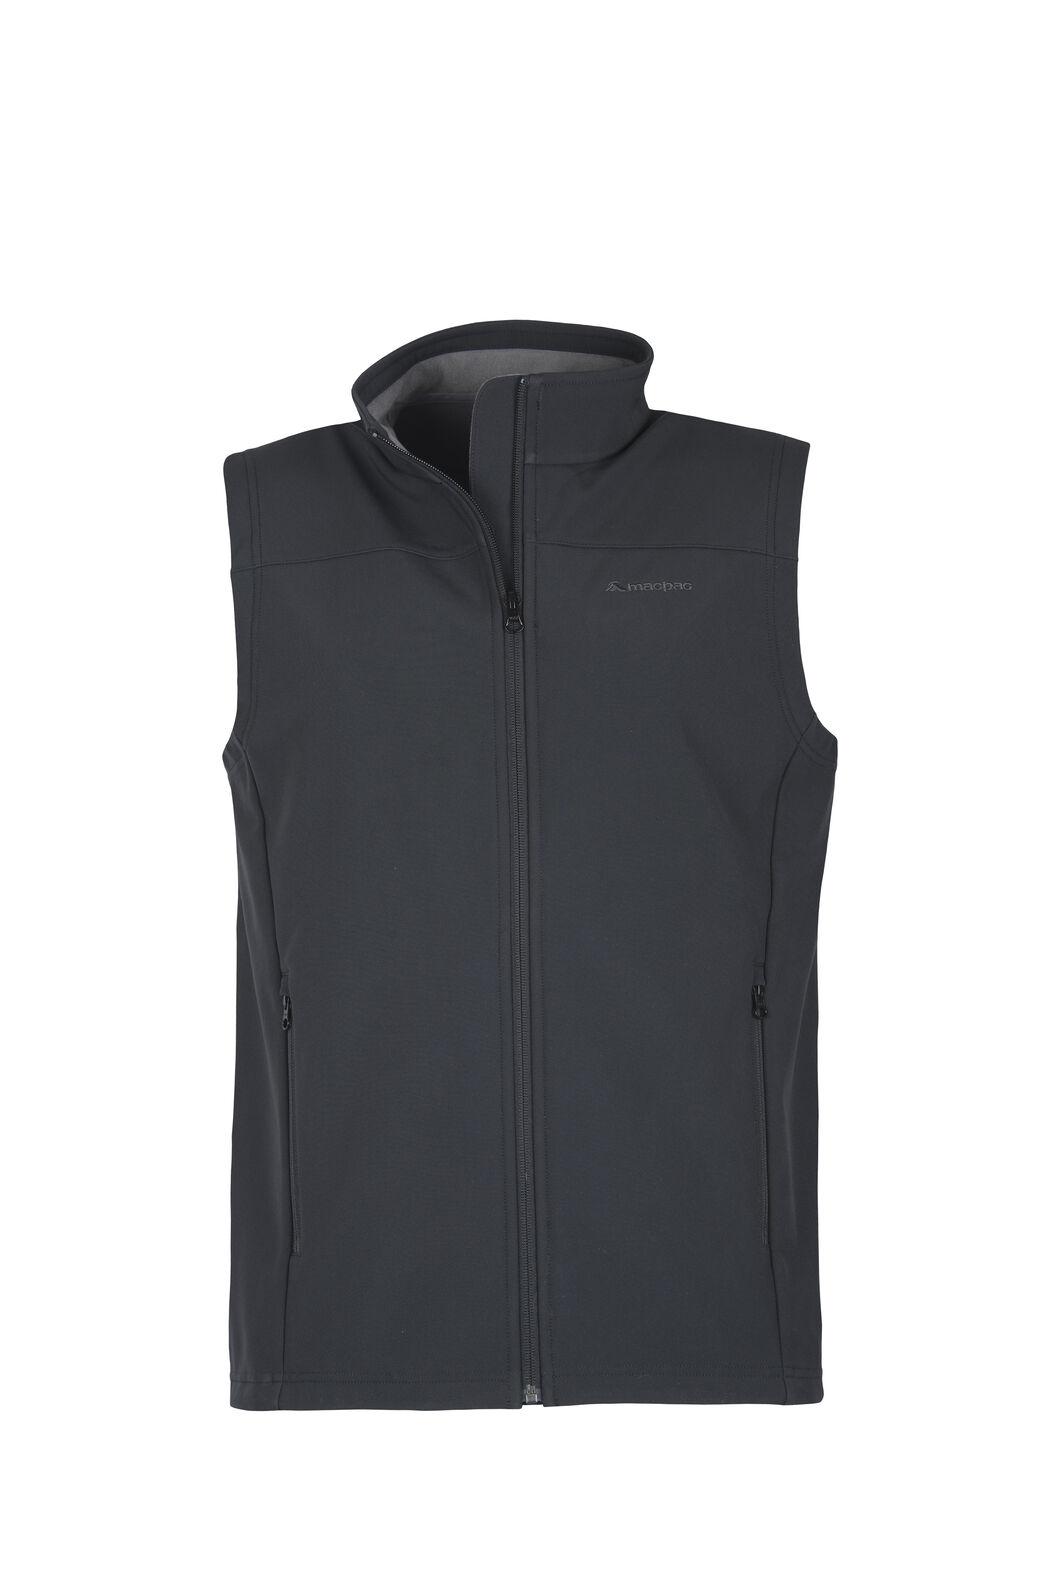 Macpac Sabre Softshell Vest — Men's, Black, hi-res